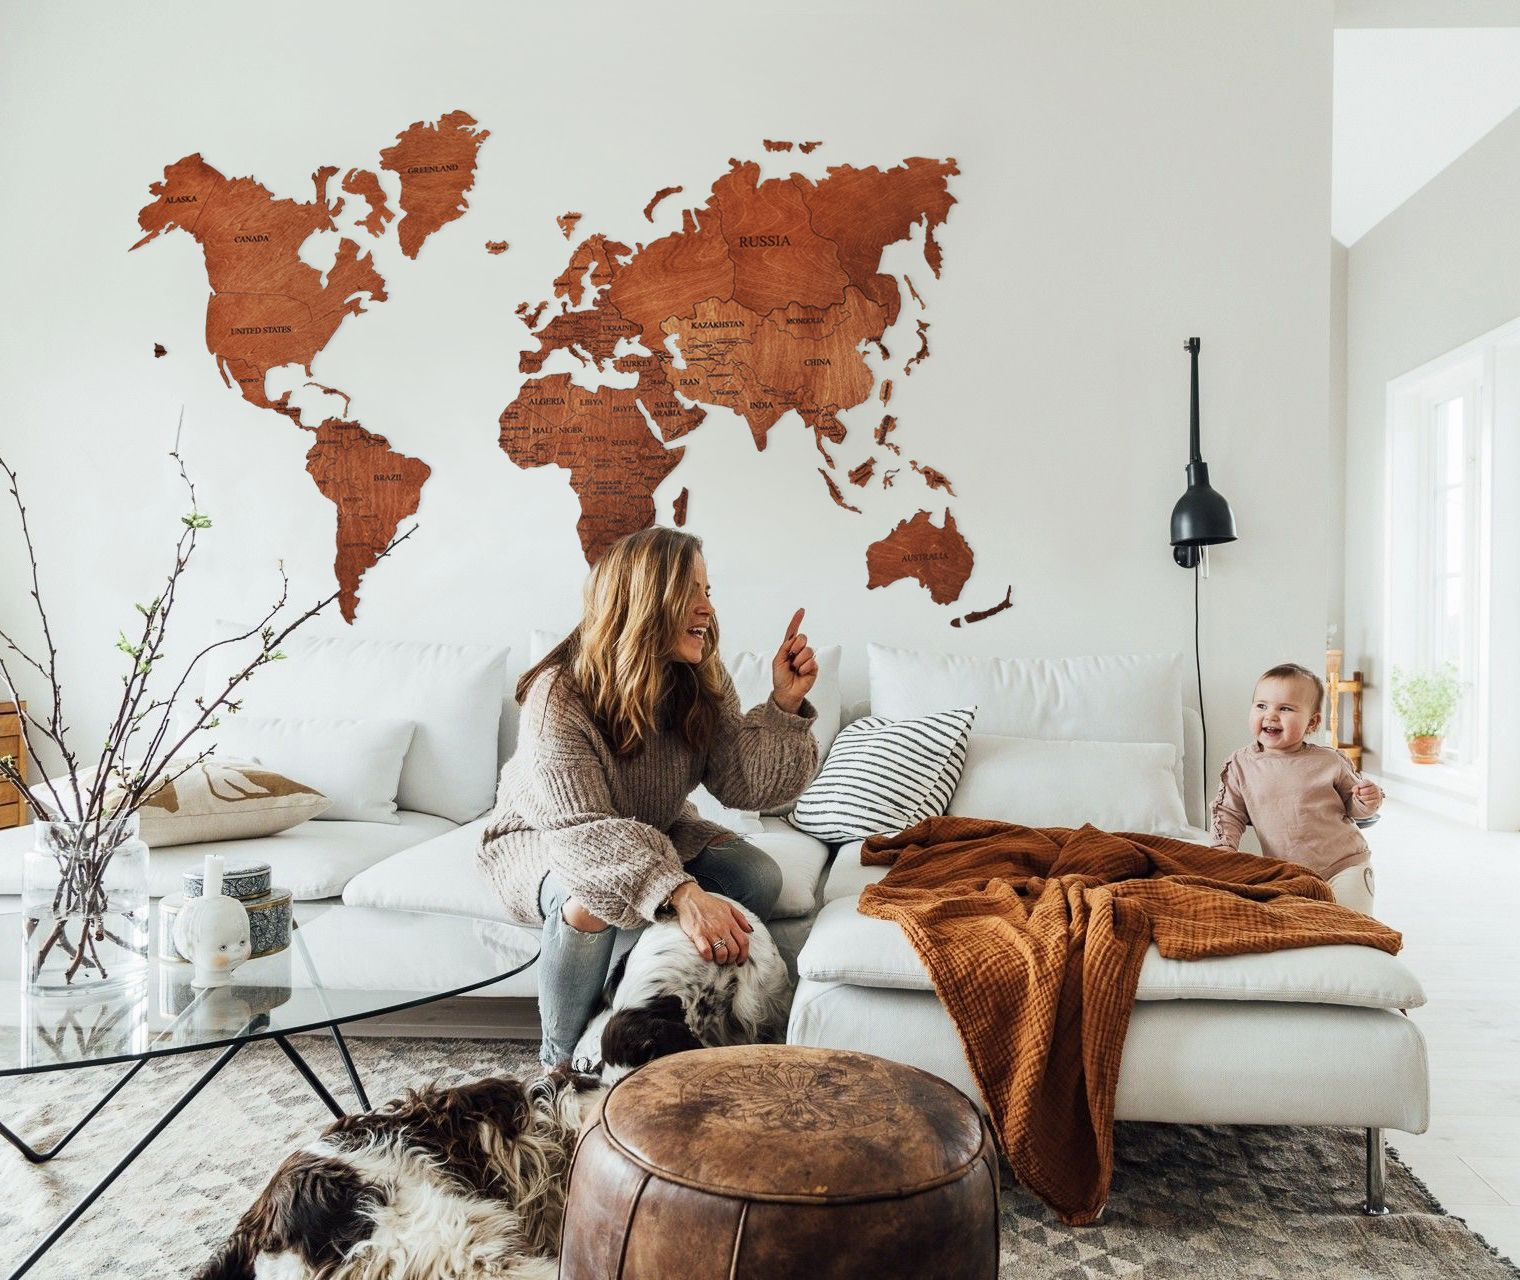 World Map Wall Art Wood Wall Art Rustic Wall Map Wood Map Push Etsy Living Room Decor Rustic Map Decor World Map Decor